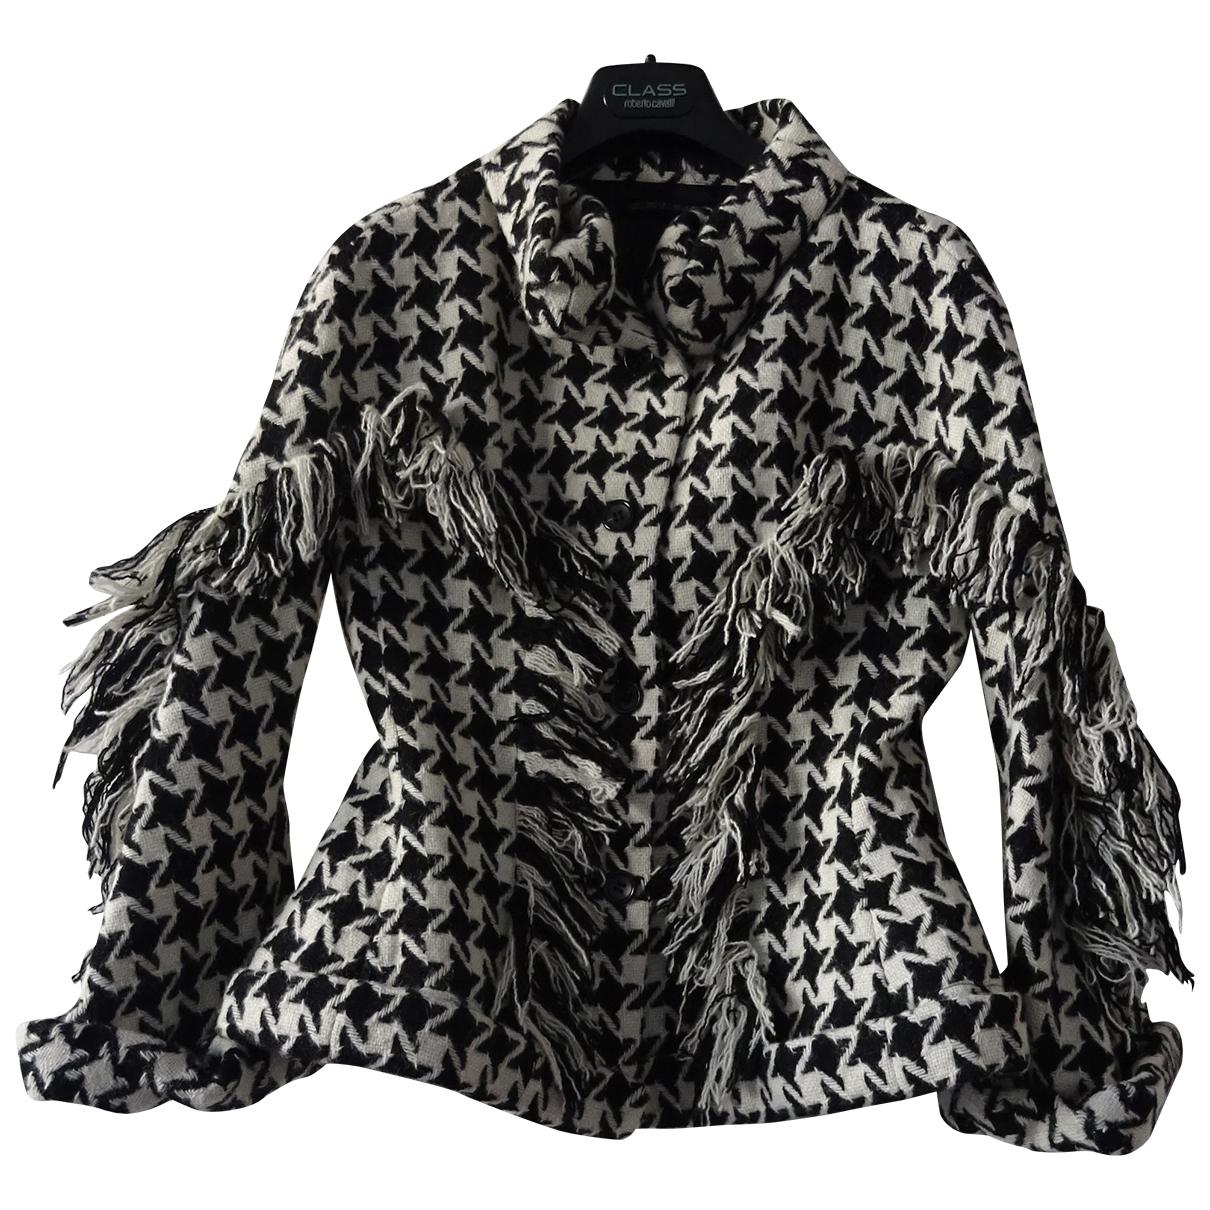 Yohji Yamamoto \N Black Wool jacket for Women 1 0-5